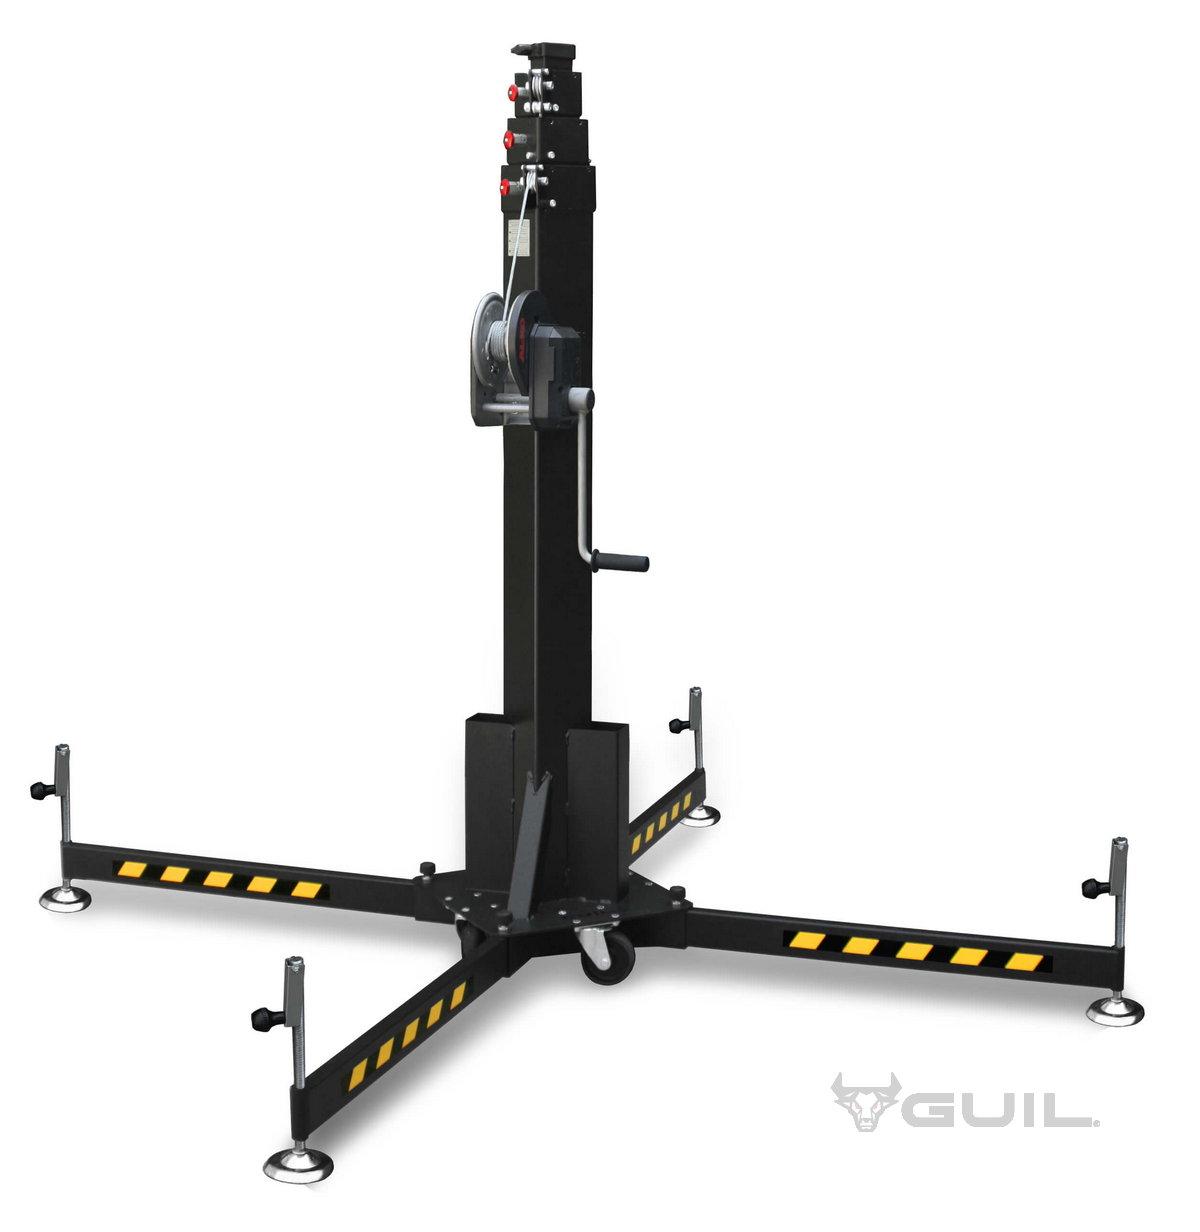 Materiaallift 1,8-5,2 m 280 kg (dutch) (1)